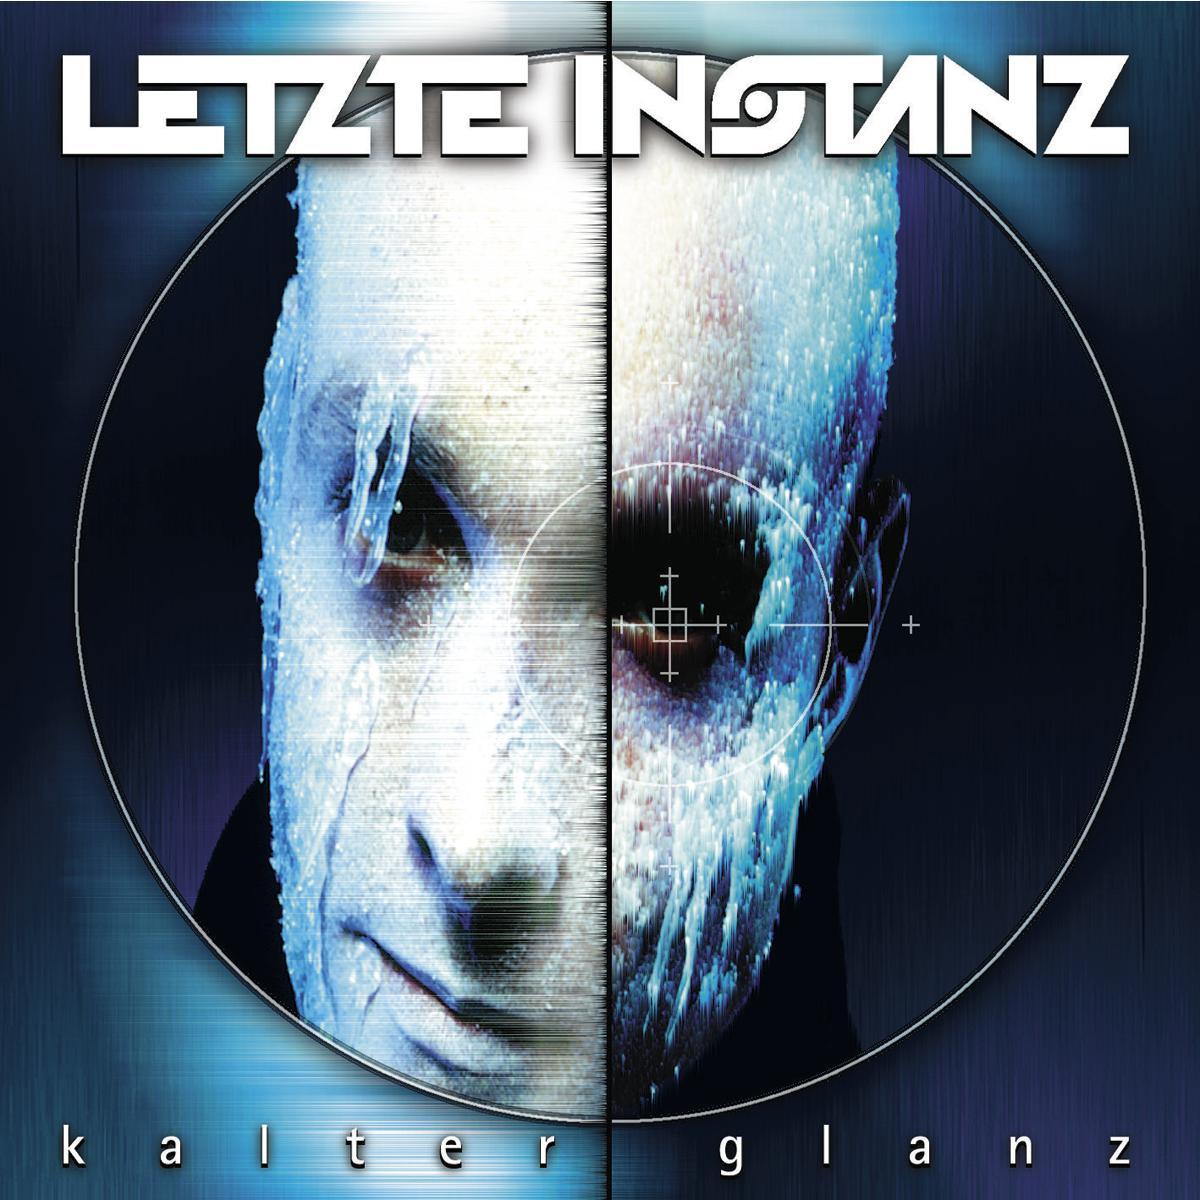 Letzte Instanz: Kalter Glanz (2002) Book Cover